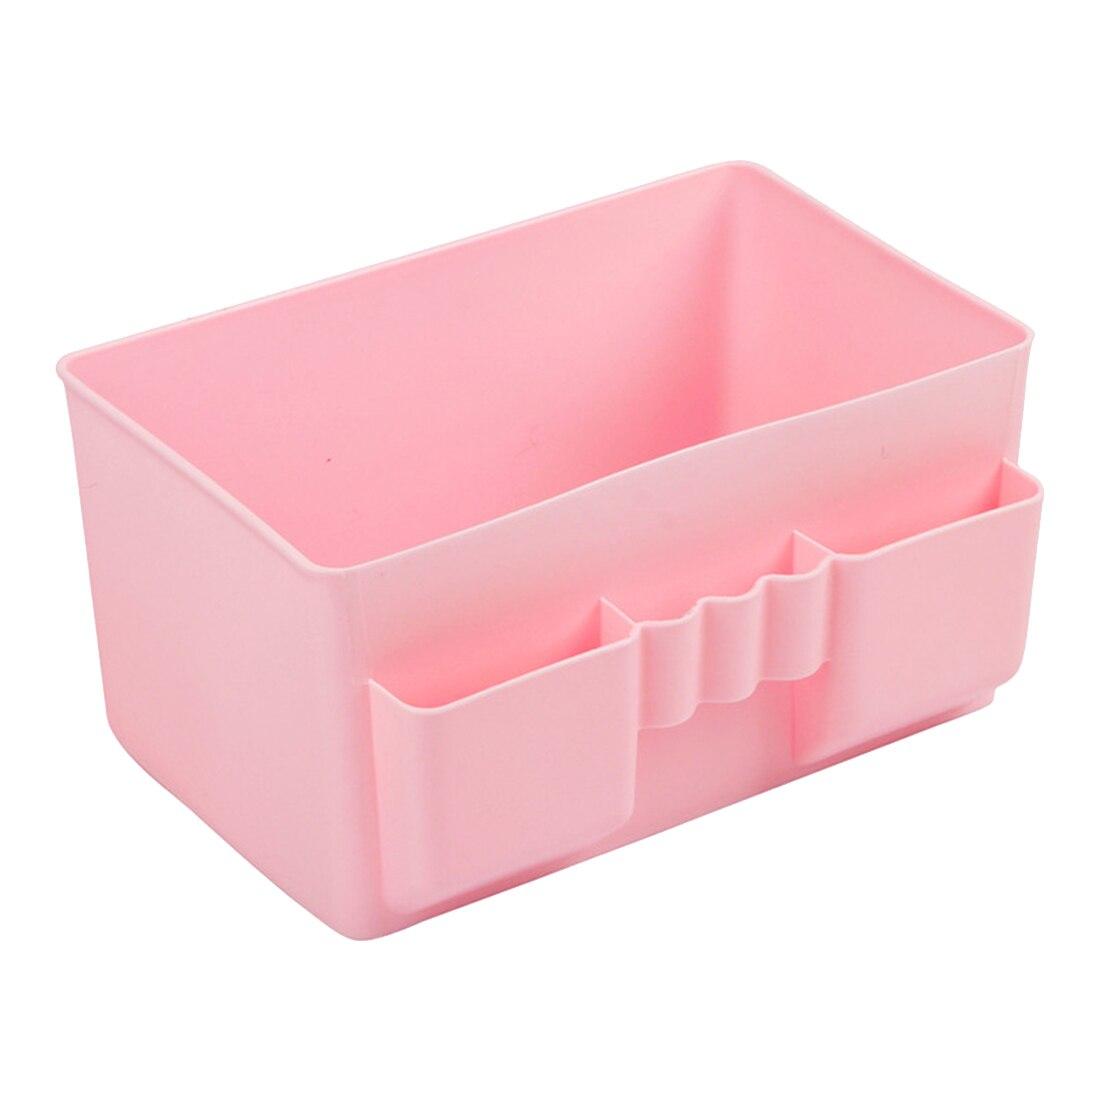 Hot Sale Cute Plastic Office Desktop Storage Boxes Makeup Organizer Storage Box